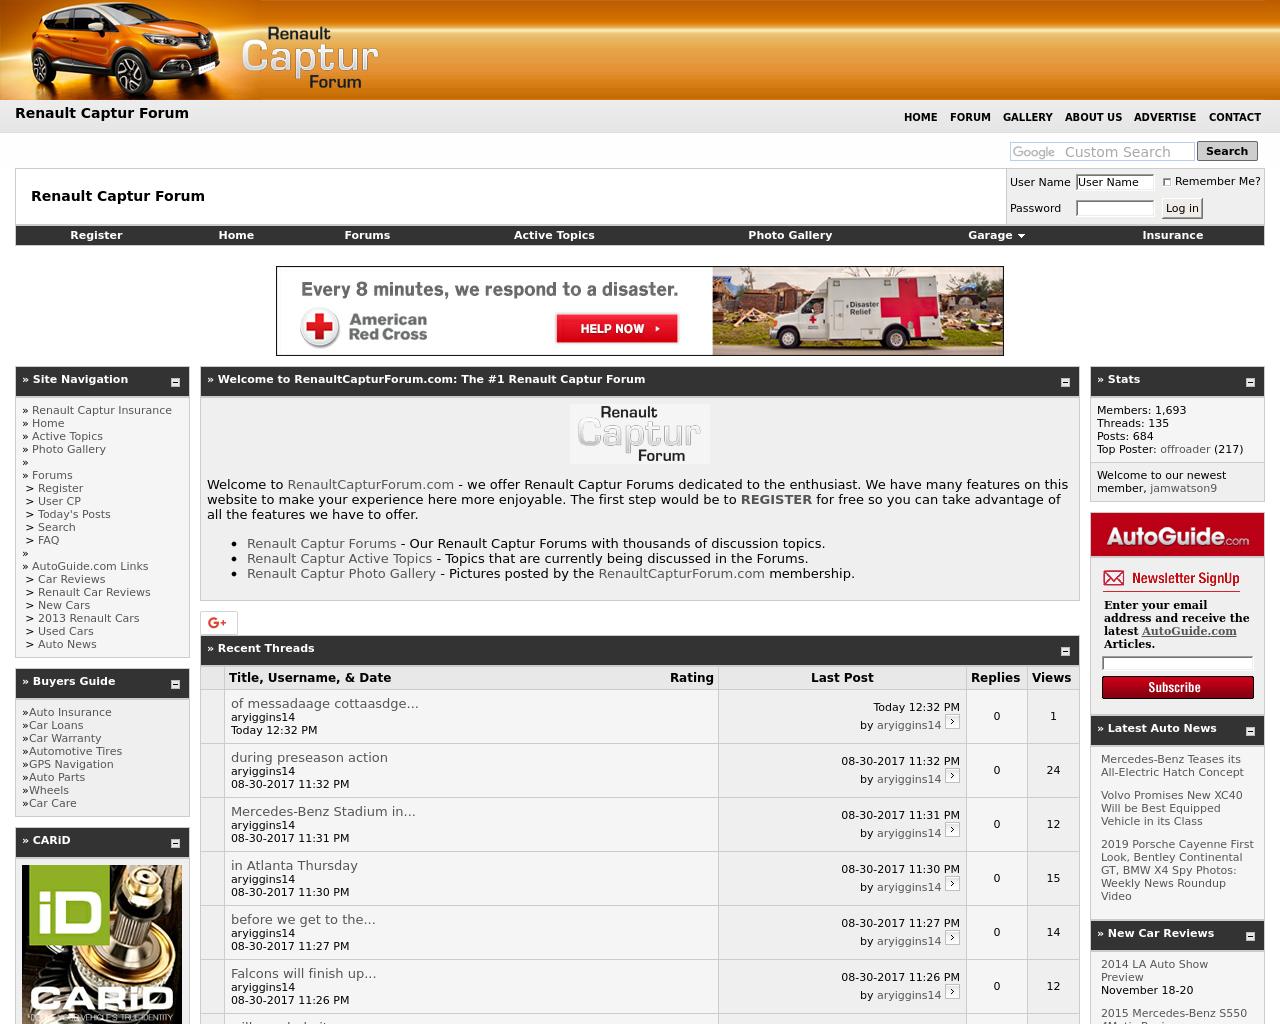 Renault-Captur-Forum-Advertising-Reviews-Pricing